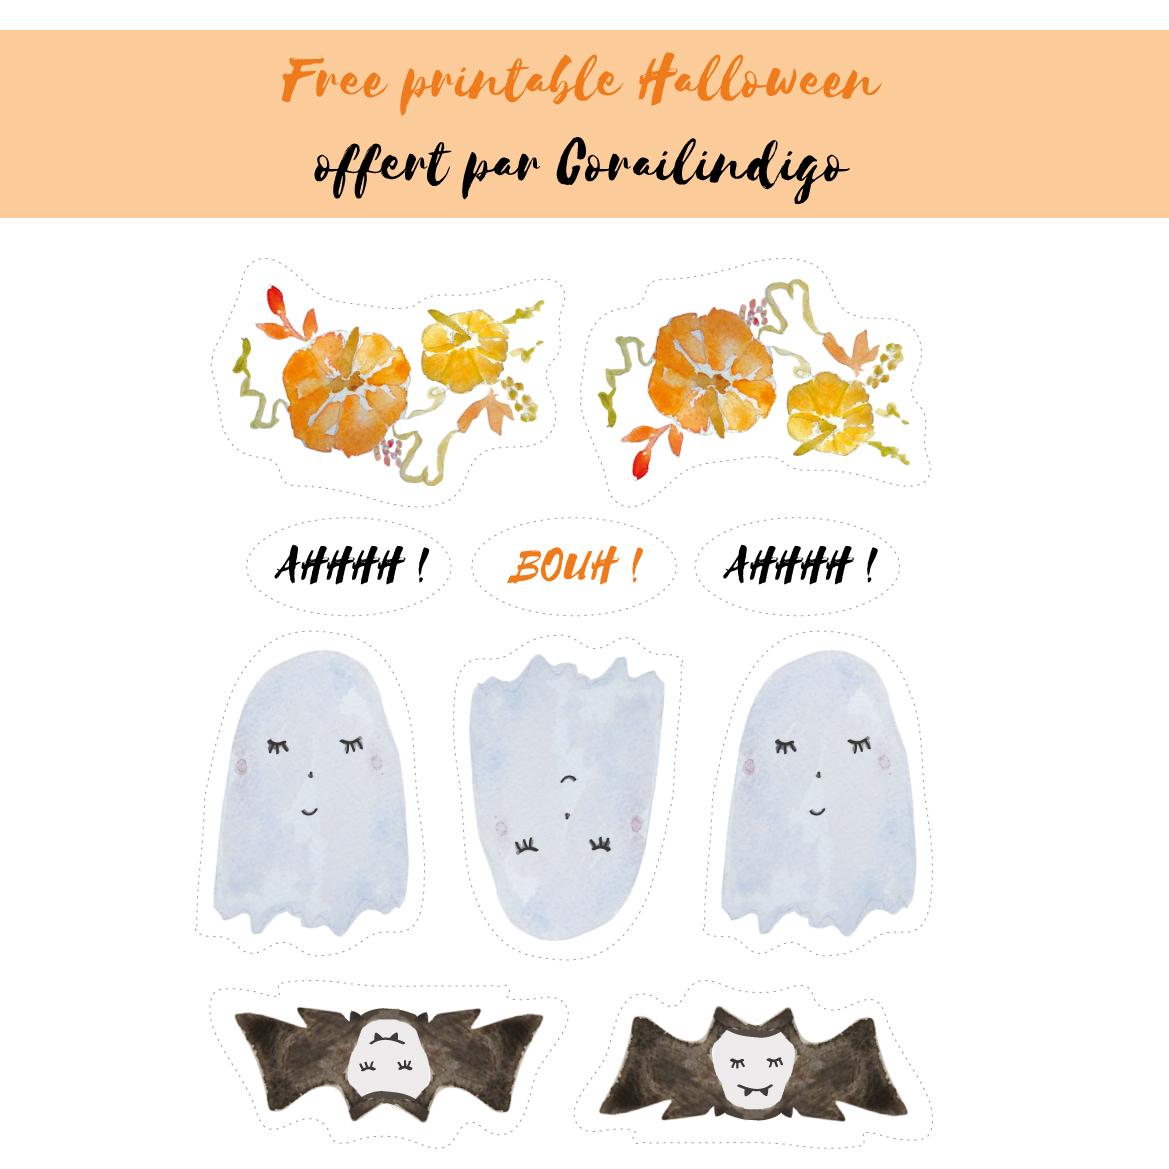 corailindigo-halloween-free-printable